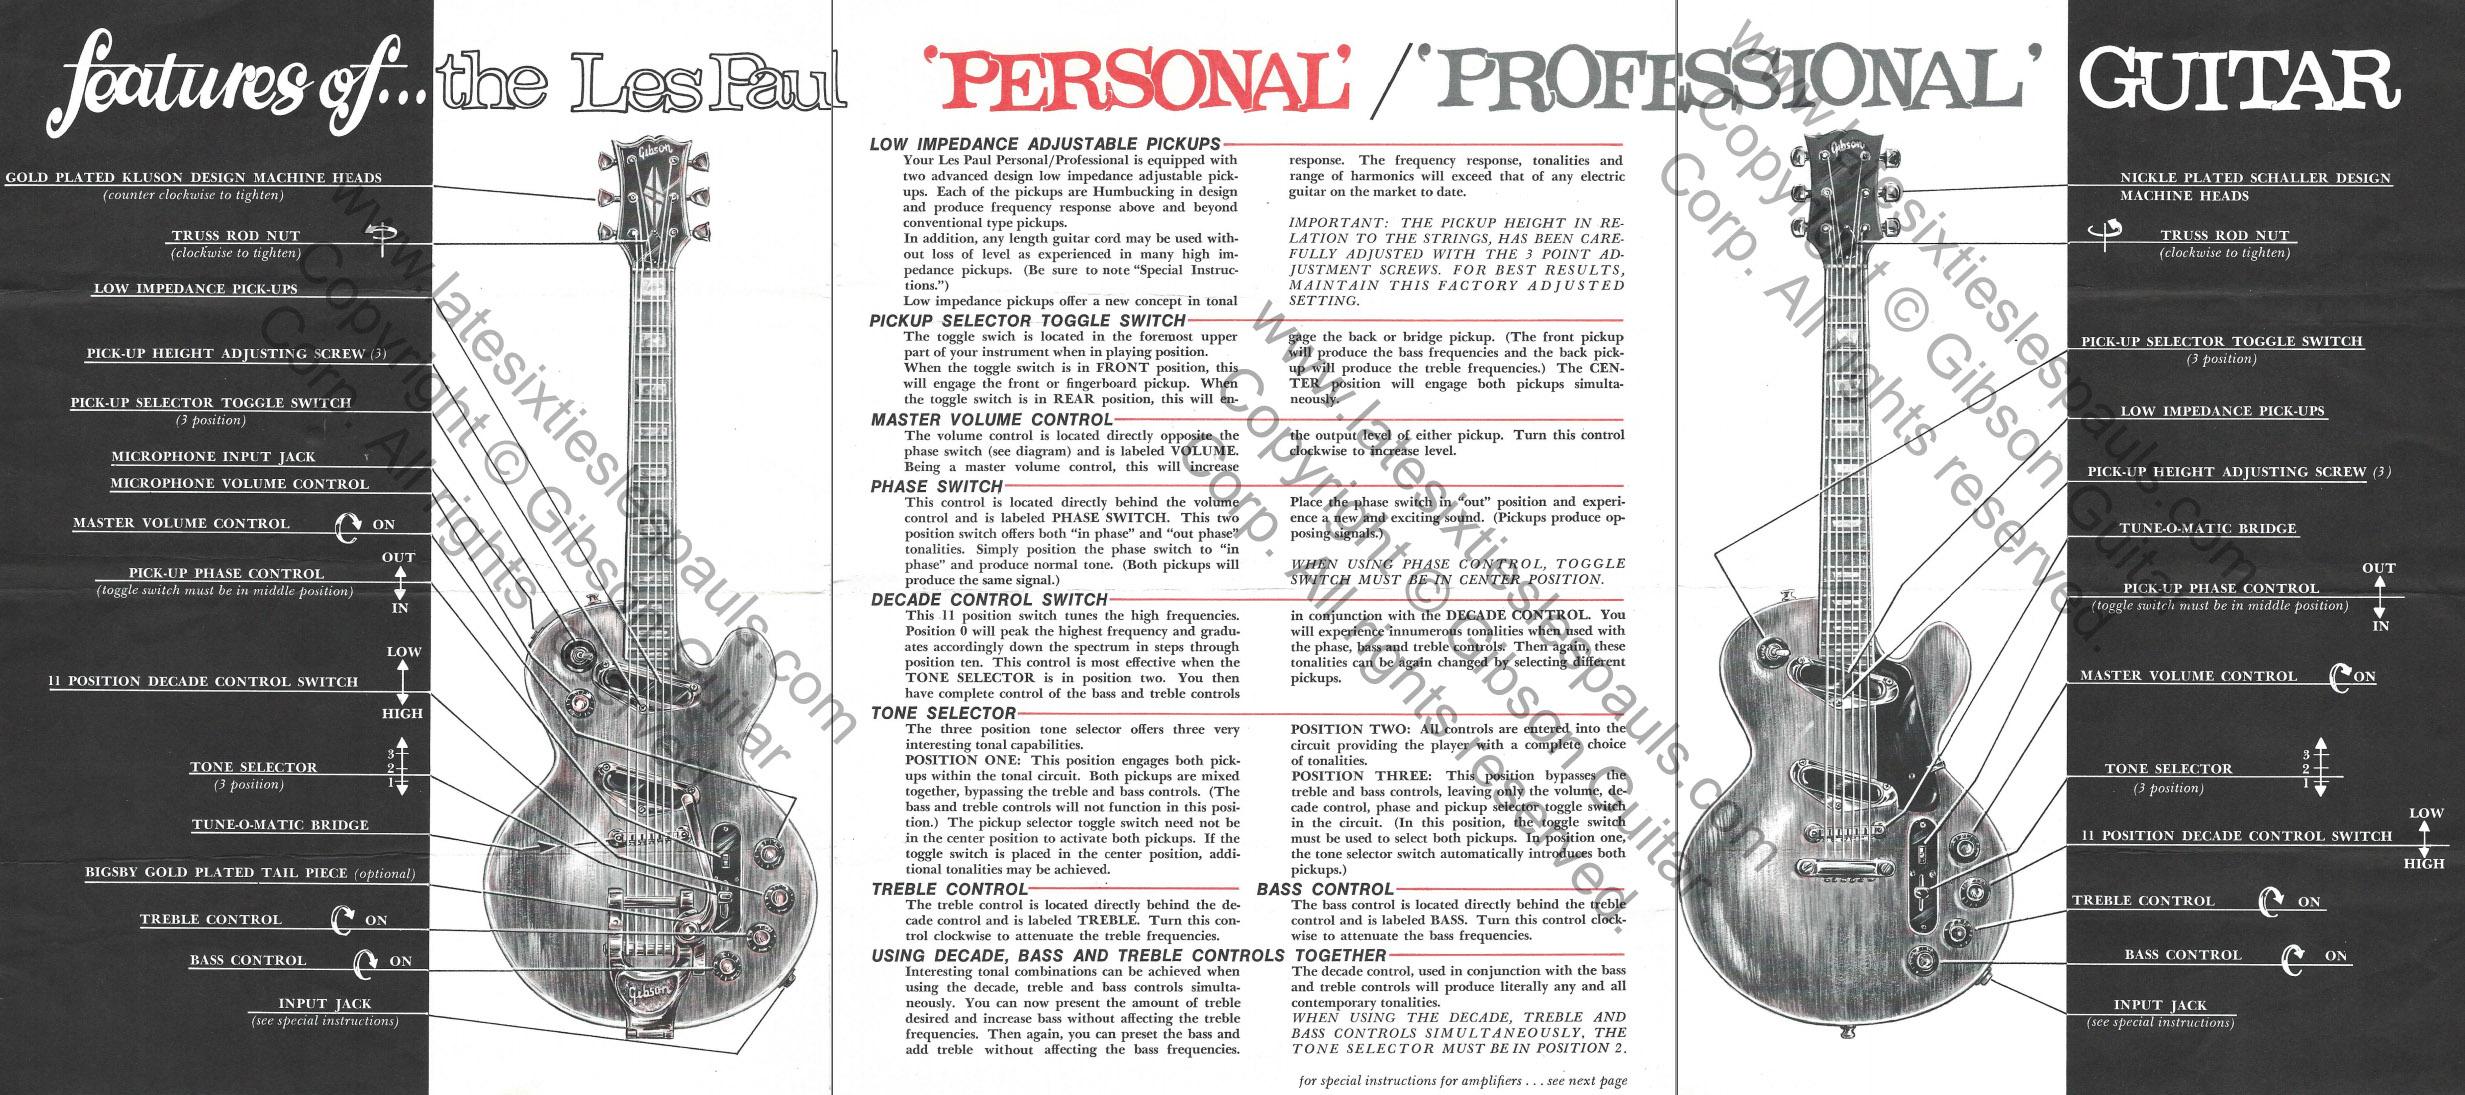 Les Paul Guitar Manual Ukulele String Diagram Free Download Wiring Schematic 1968 And 1969 Serial Number Information Rh Latesixtieslespauls Com Haynes Bass